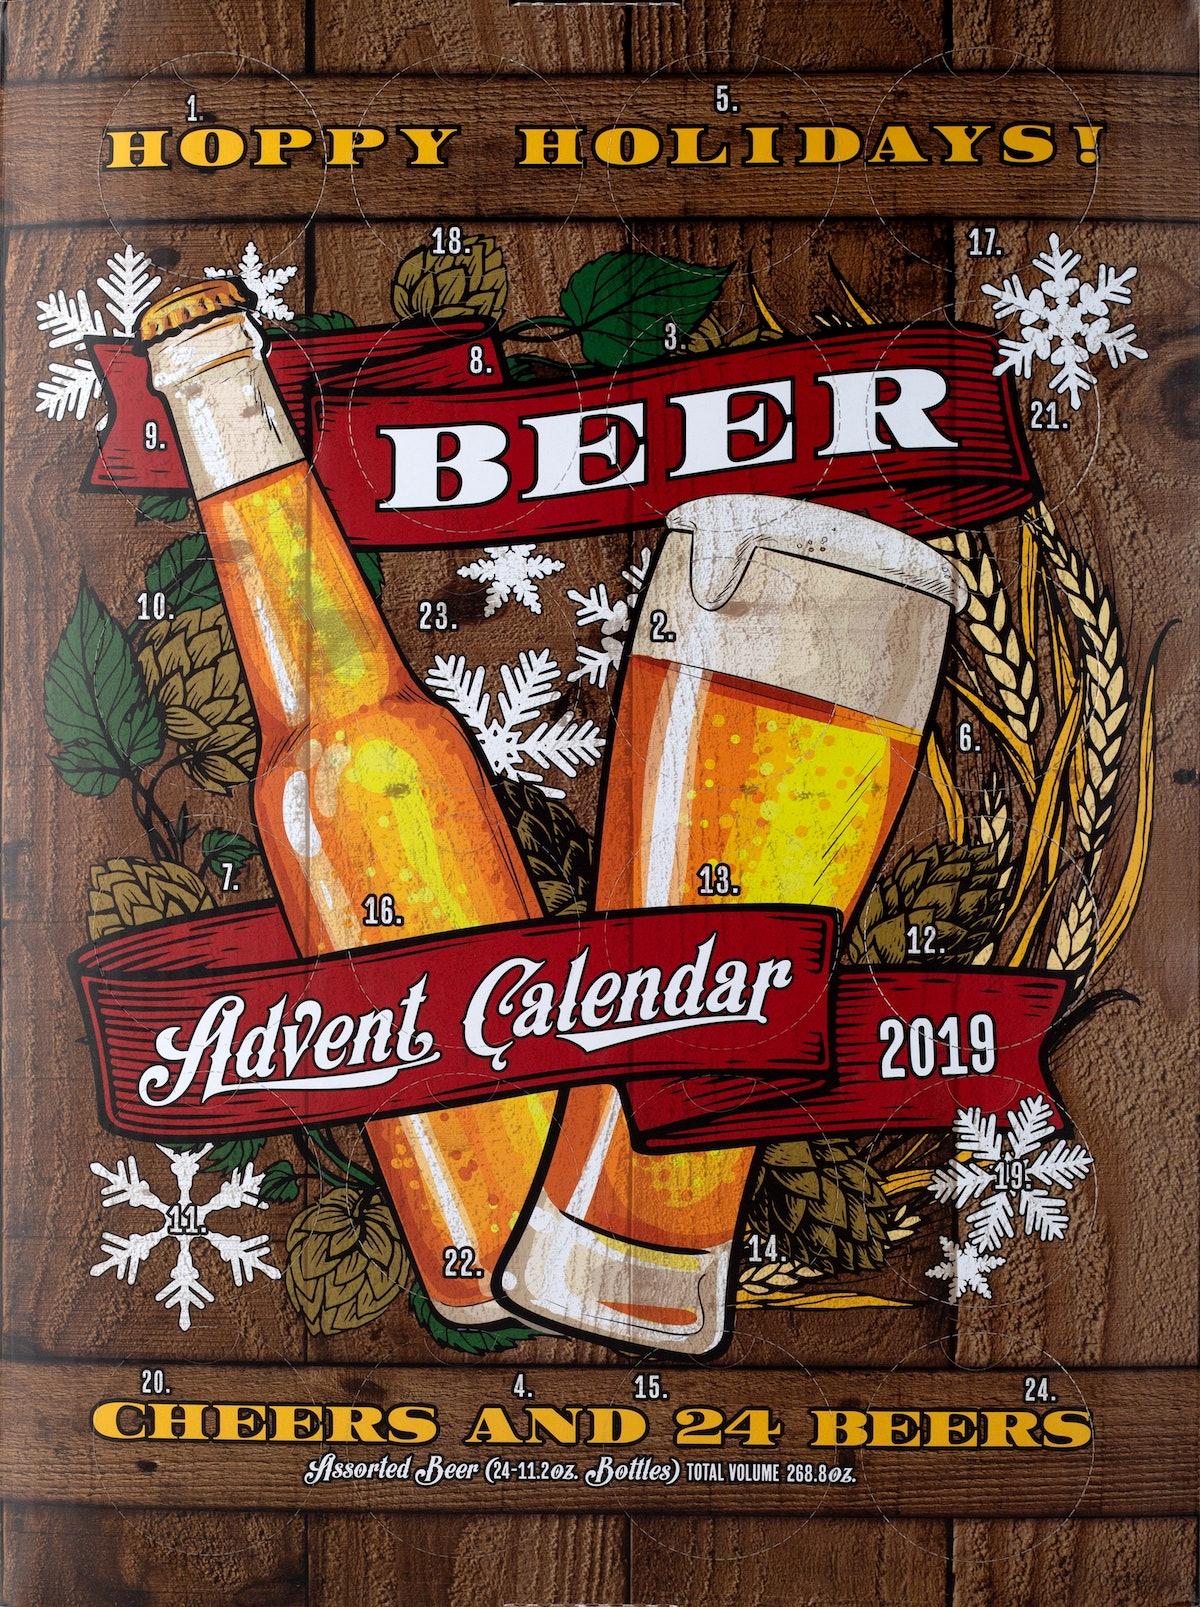 Aldi's 2019 Wine Advent Calendar is available alongside offerings like the Beer Advent Calendar.